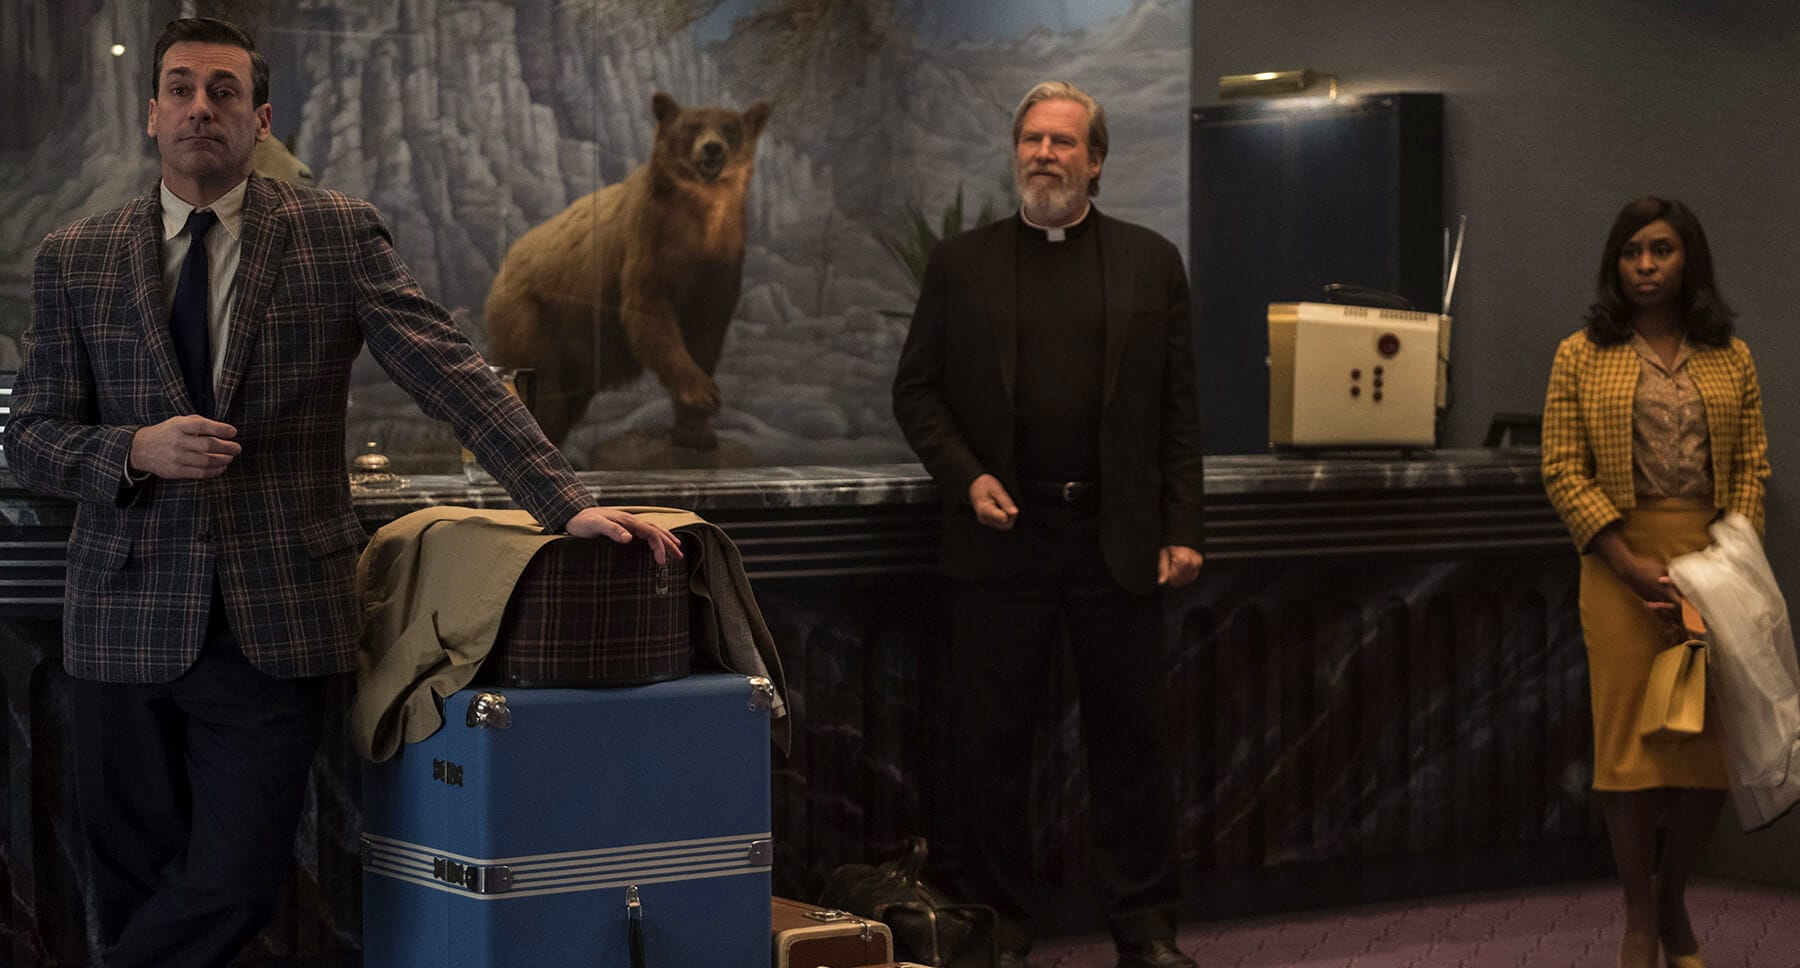 "Actors John Hamm (as Laramie Seymour Sullivan), Jeff Bridges (as Father Daniel Flynn), and Cynthia Erivo (as Darlene Sweet) in the movie "" Bad Times At The El Royale"""